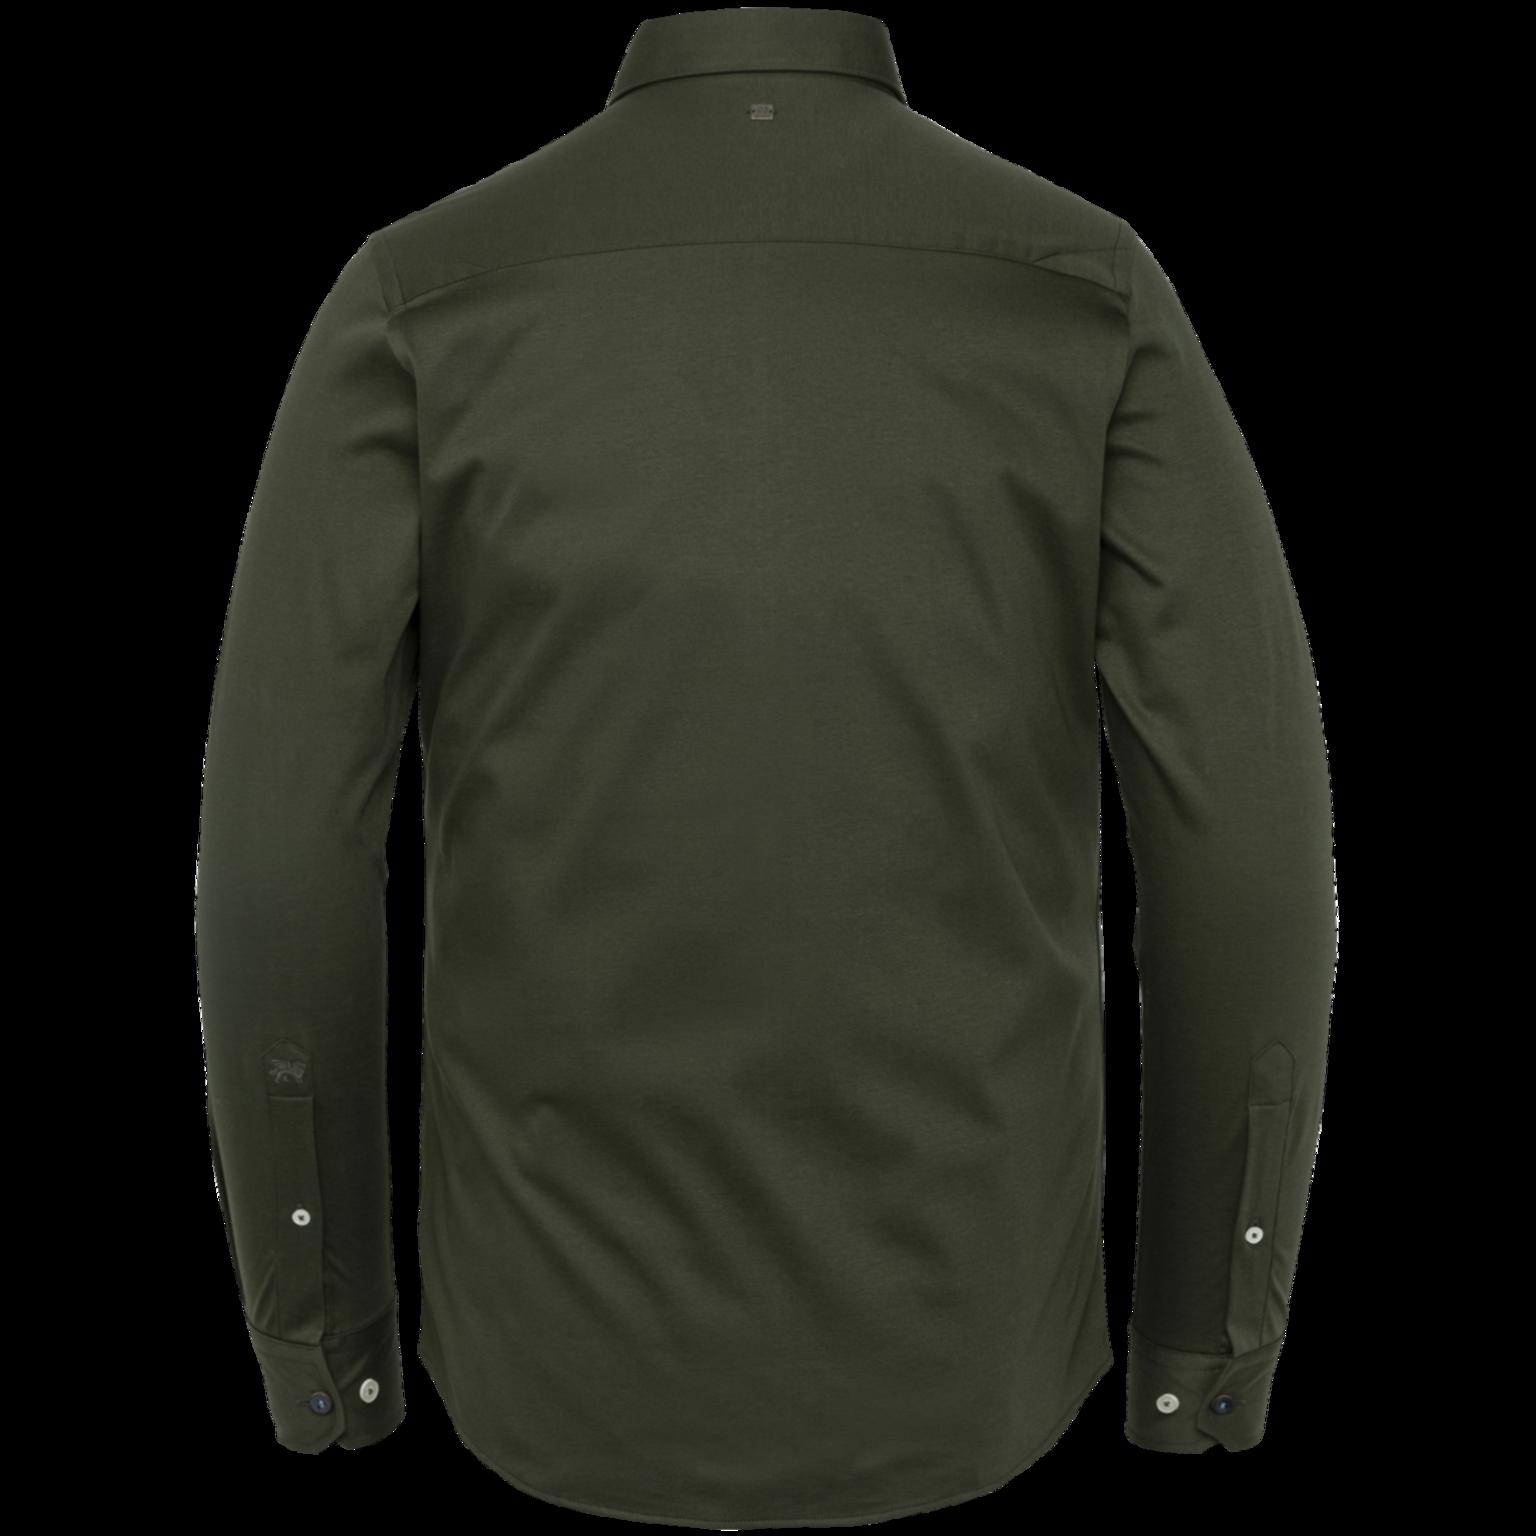 VANGUARD chemise longues manches jersey-6